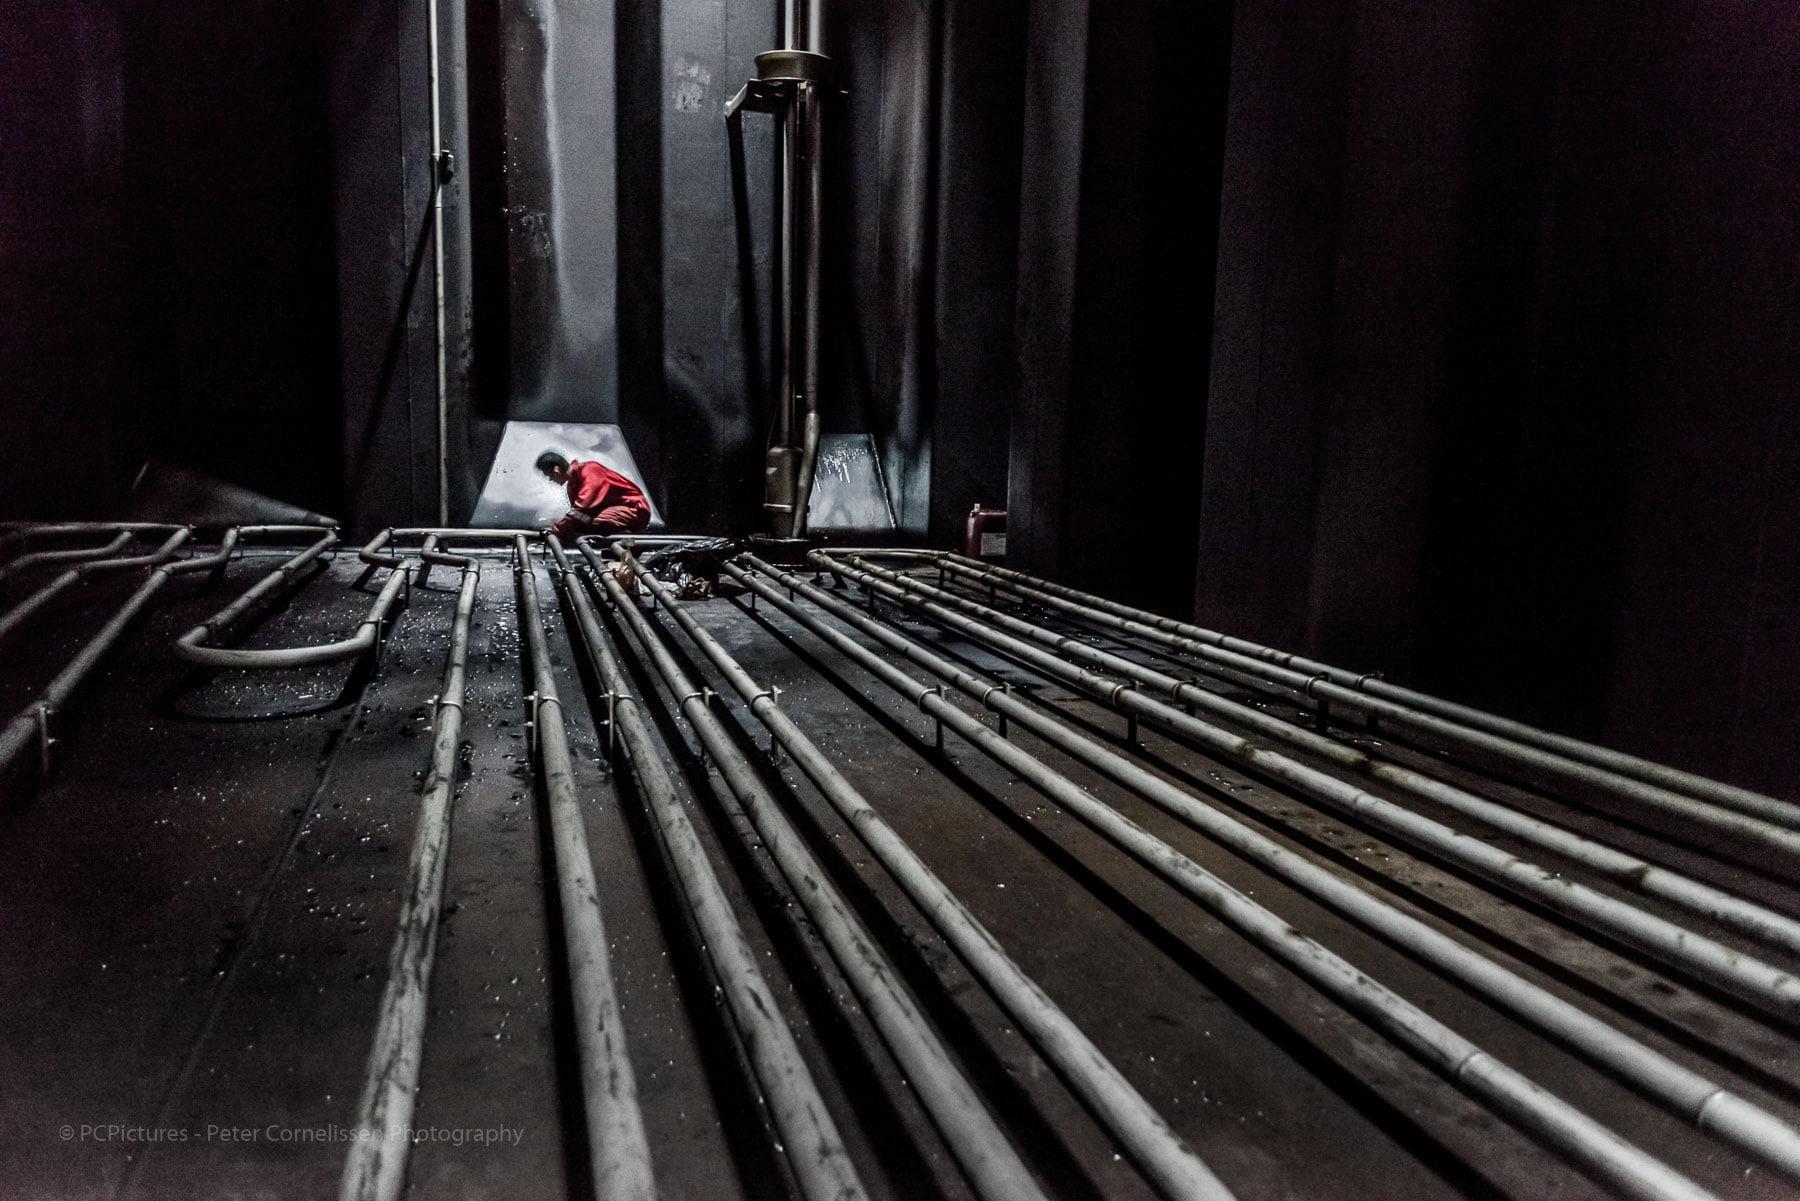 Activiteiten, Activities, Bemanning, Crew, Holland, Jervie, Jose Jervie Quiban Romero, Mensen, Nederland, Netherlands, Oil / Chemical Tankers, Olie / Chemicalieën tankers, People, Places, Rotterdam, Schepen, Shipping, Ships, Tank cleaning, Tankers, Thun Gothenburg, scheepvaart, zeevaart